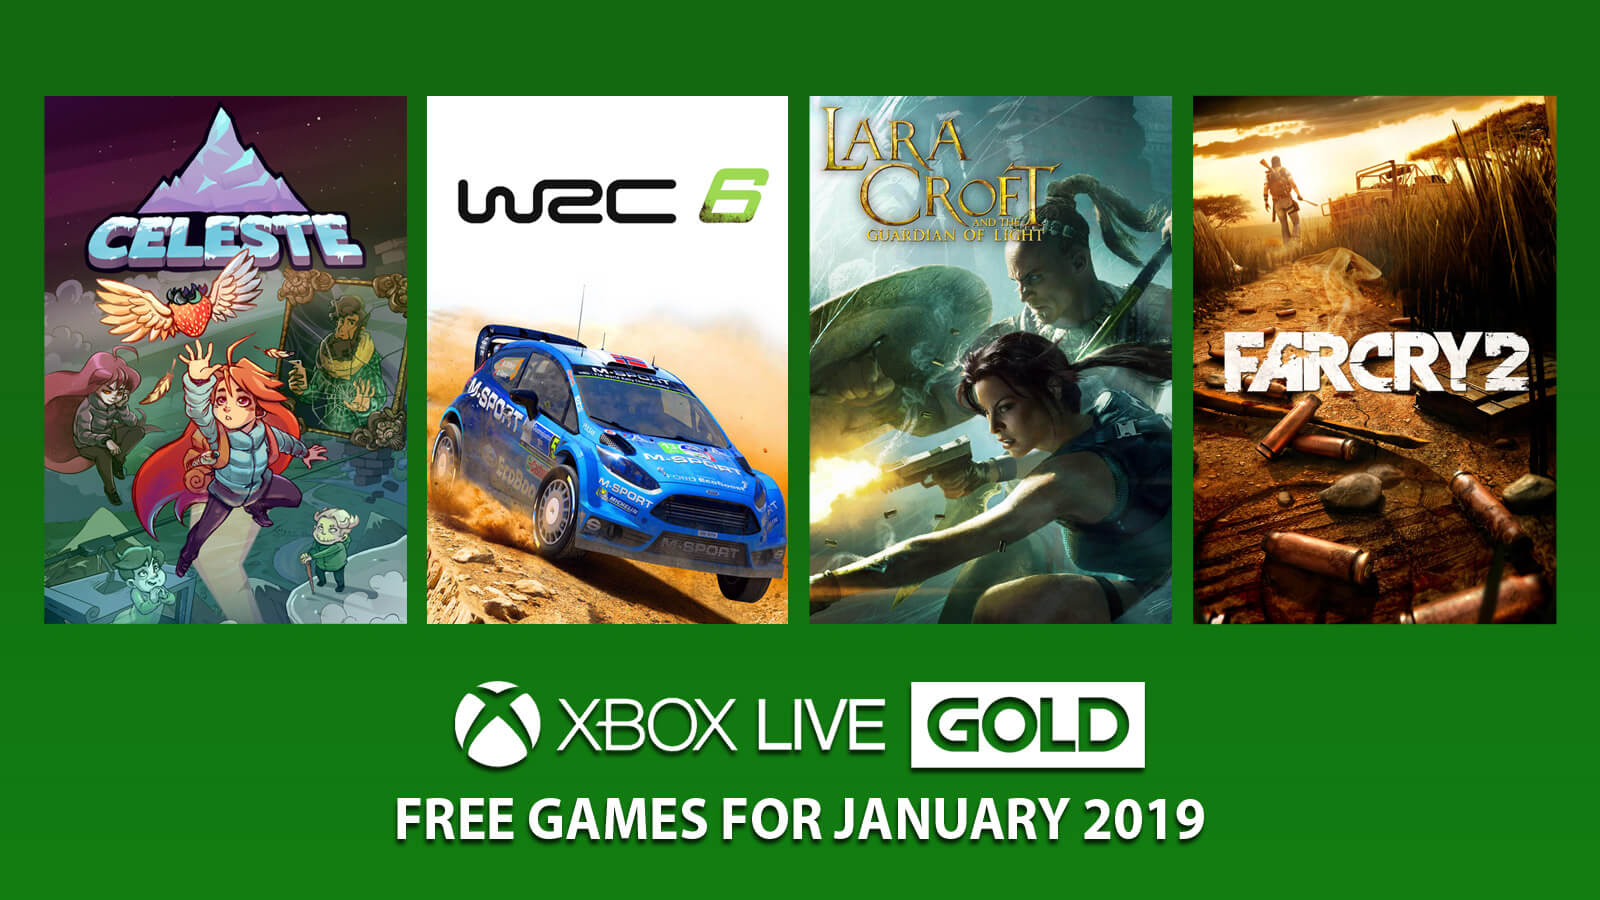 Xbox live free games february 2019